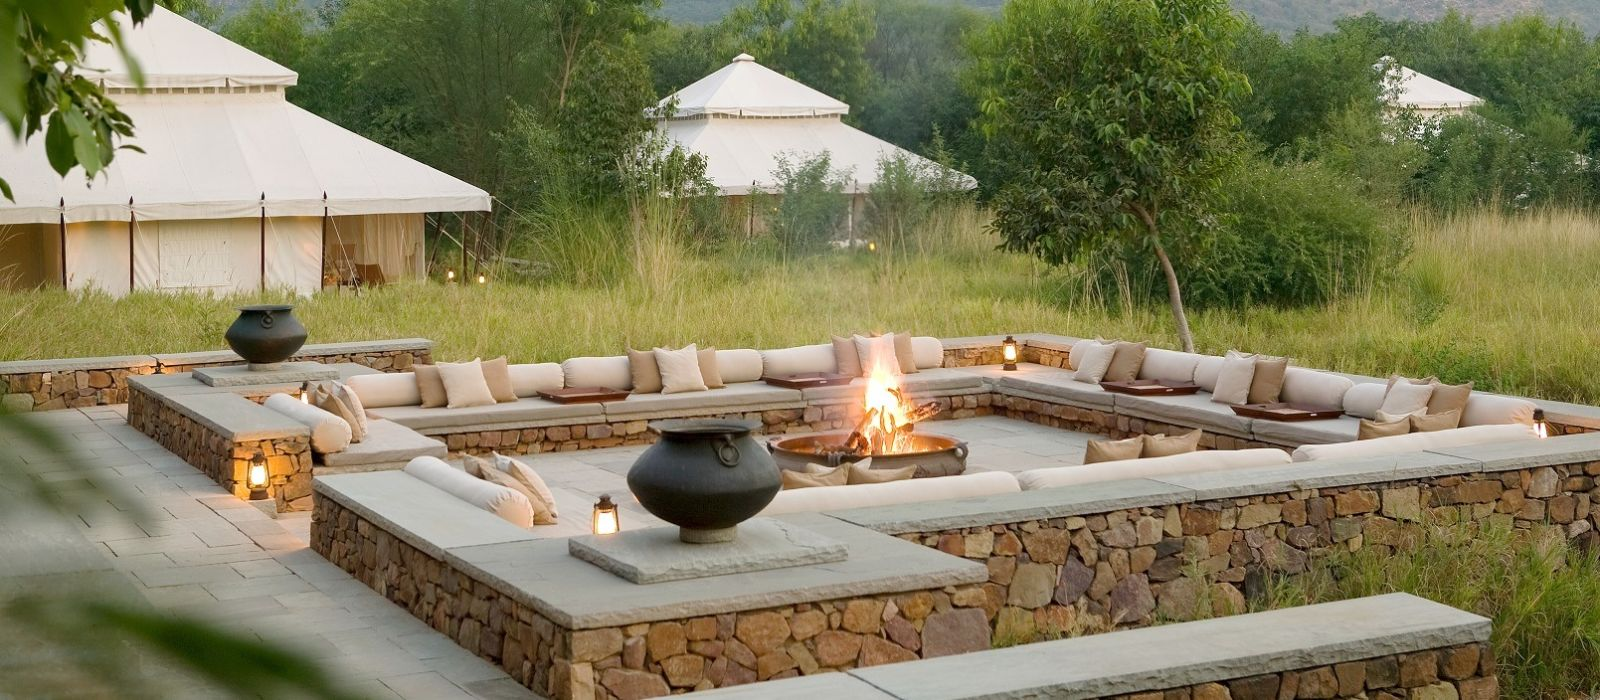 Oberoi Exclusive: Royal Rajasthan and Safari Special Tour Trip 5